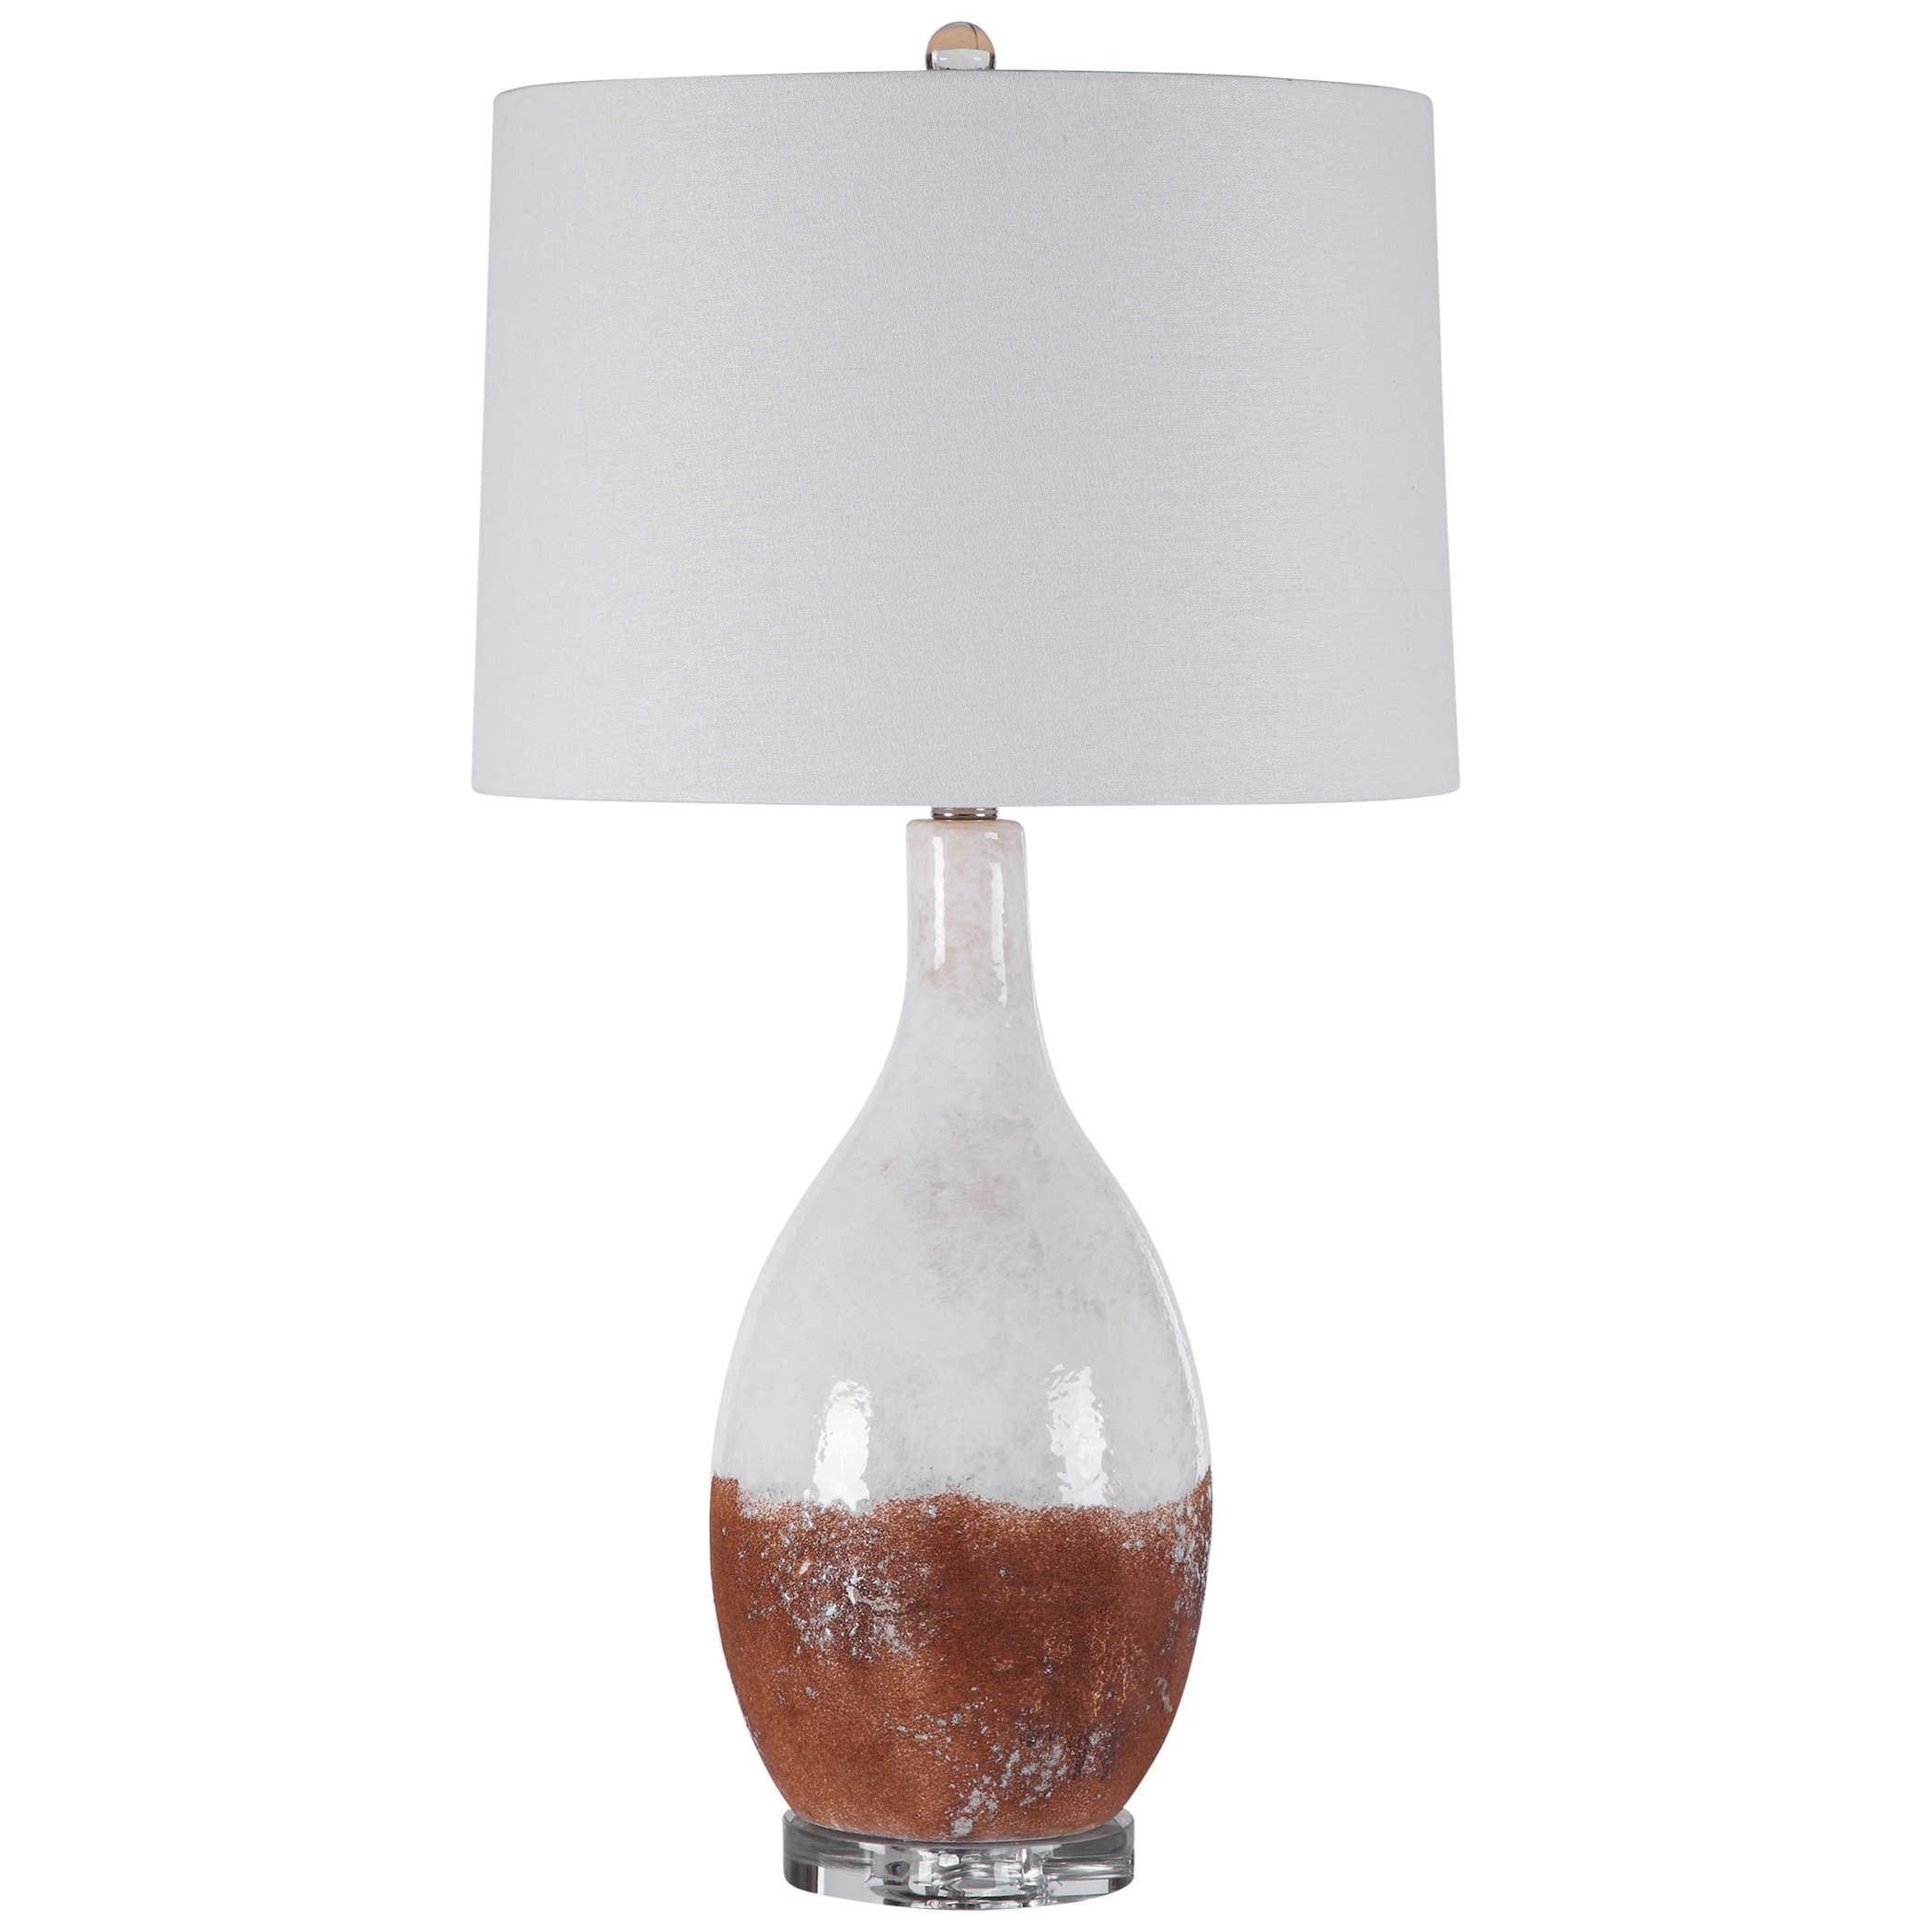 Durango Rust White Table Lamp